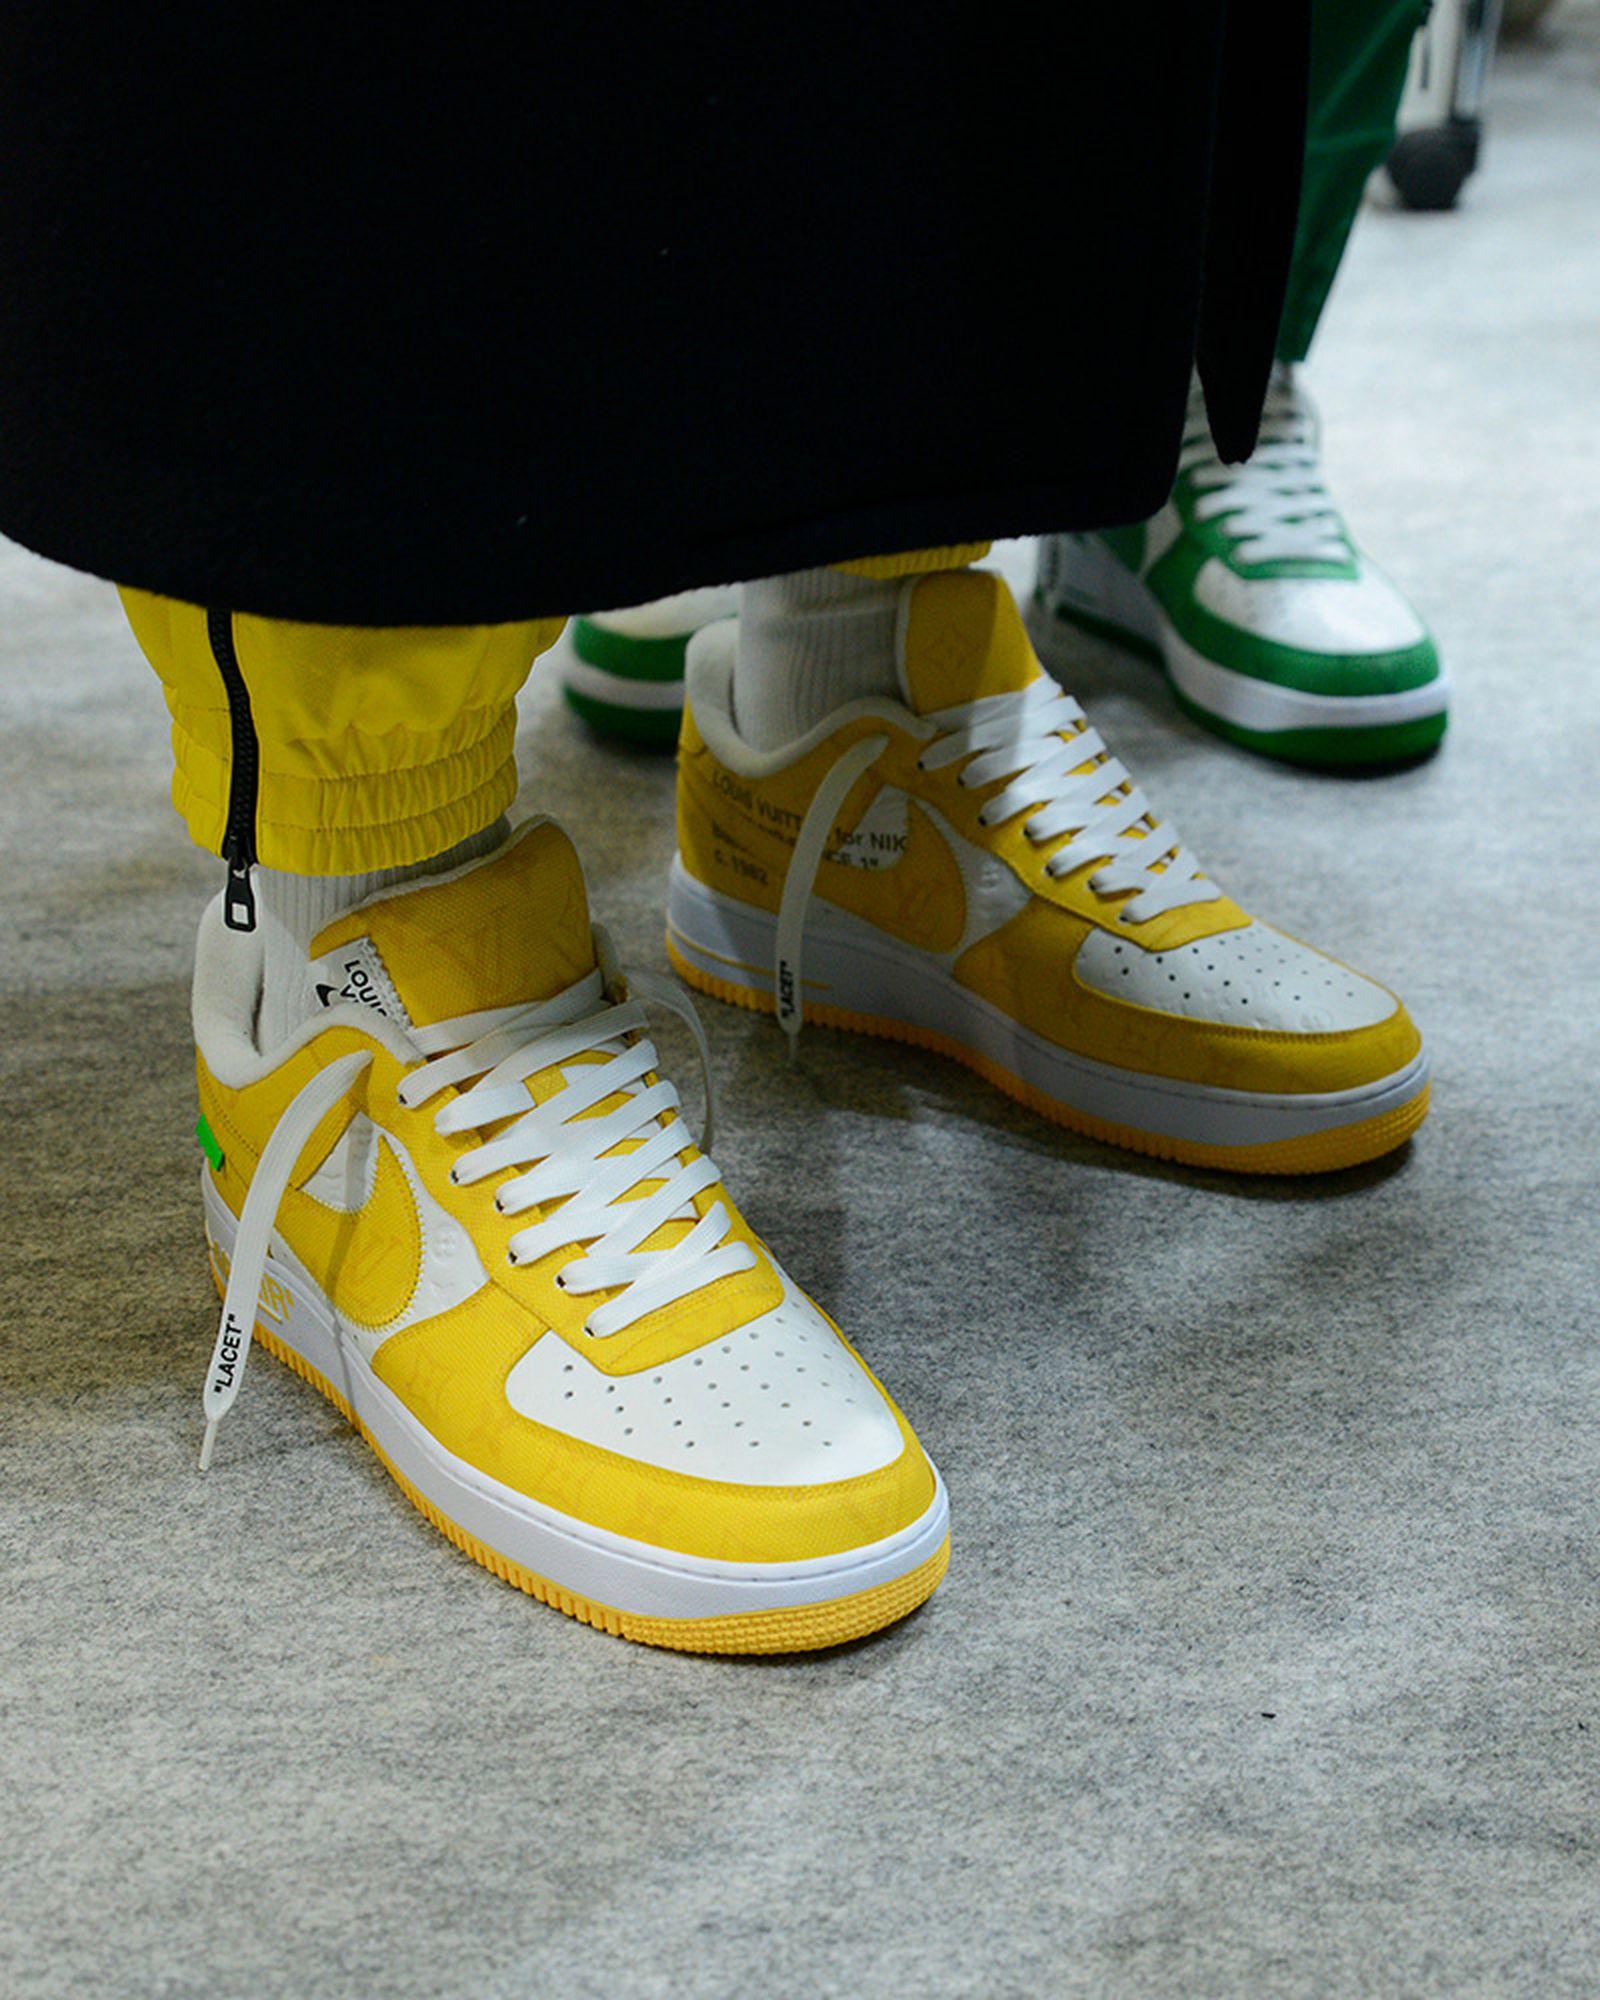 louis-vuitton-nike-virgil-abloh-sneaker-reveal-04